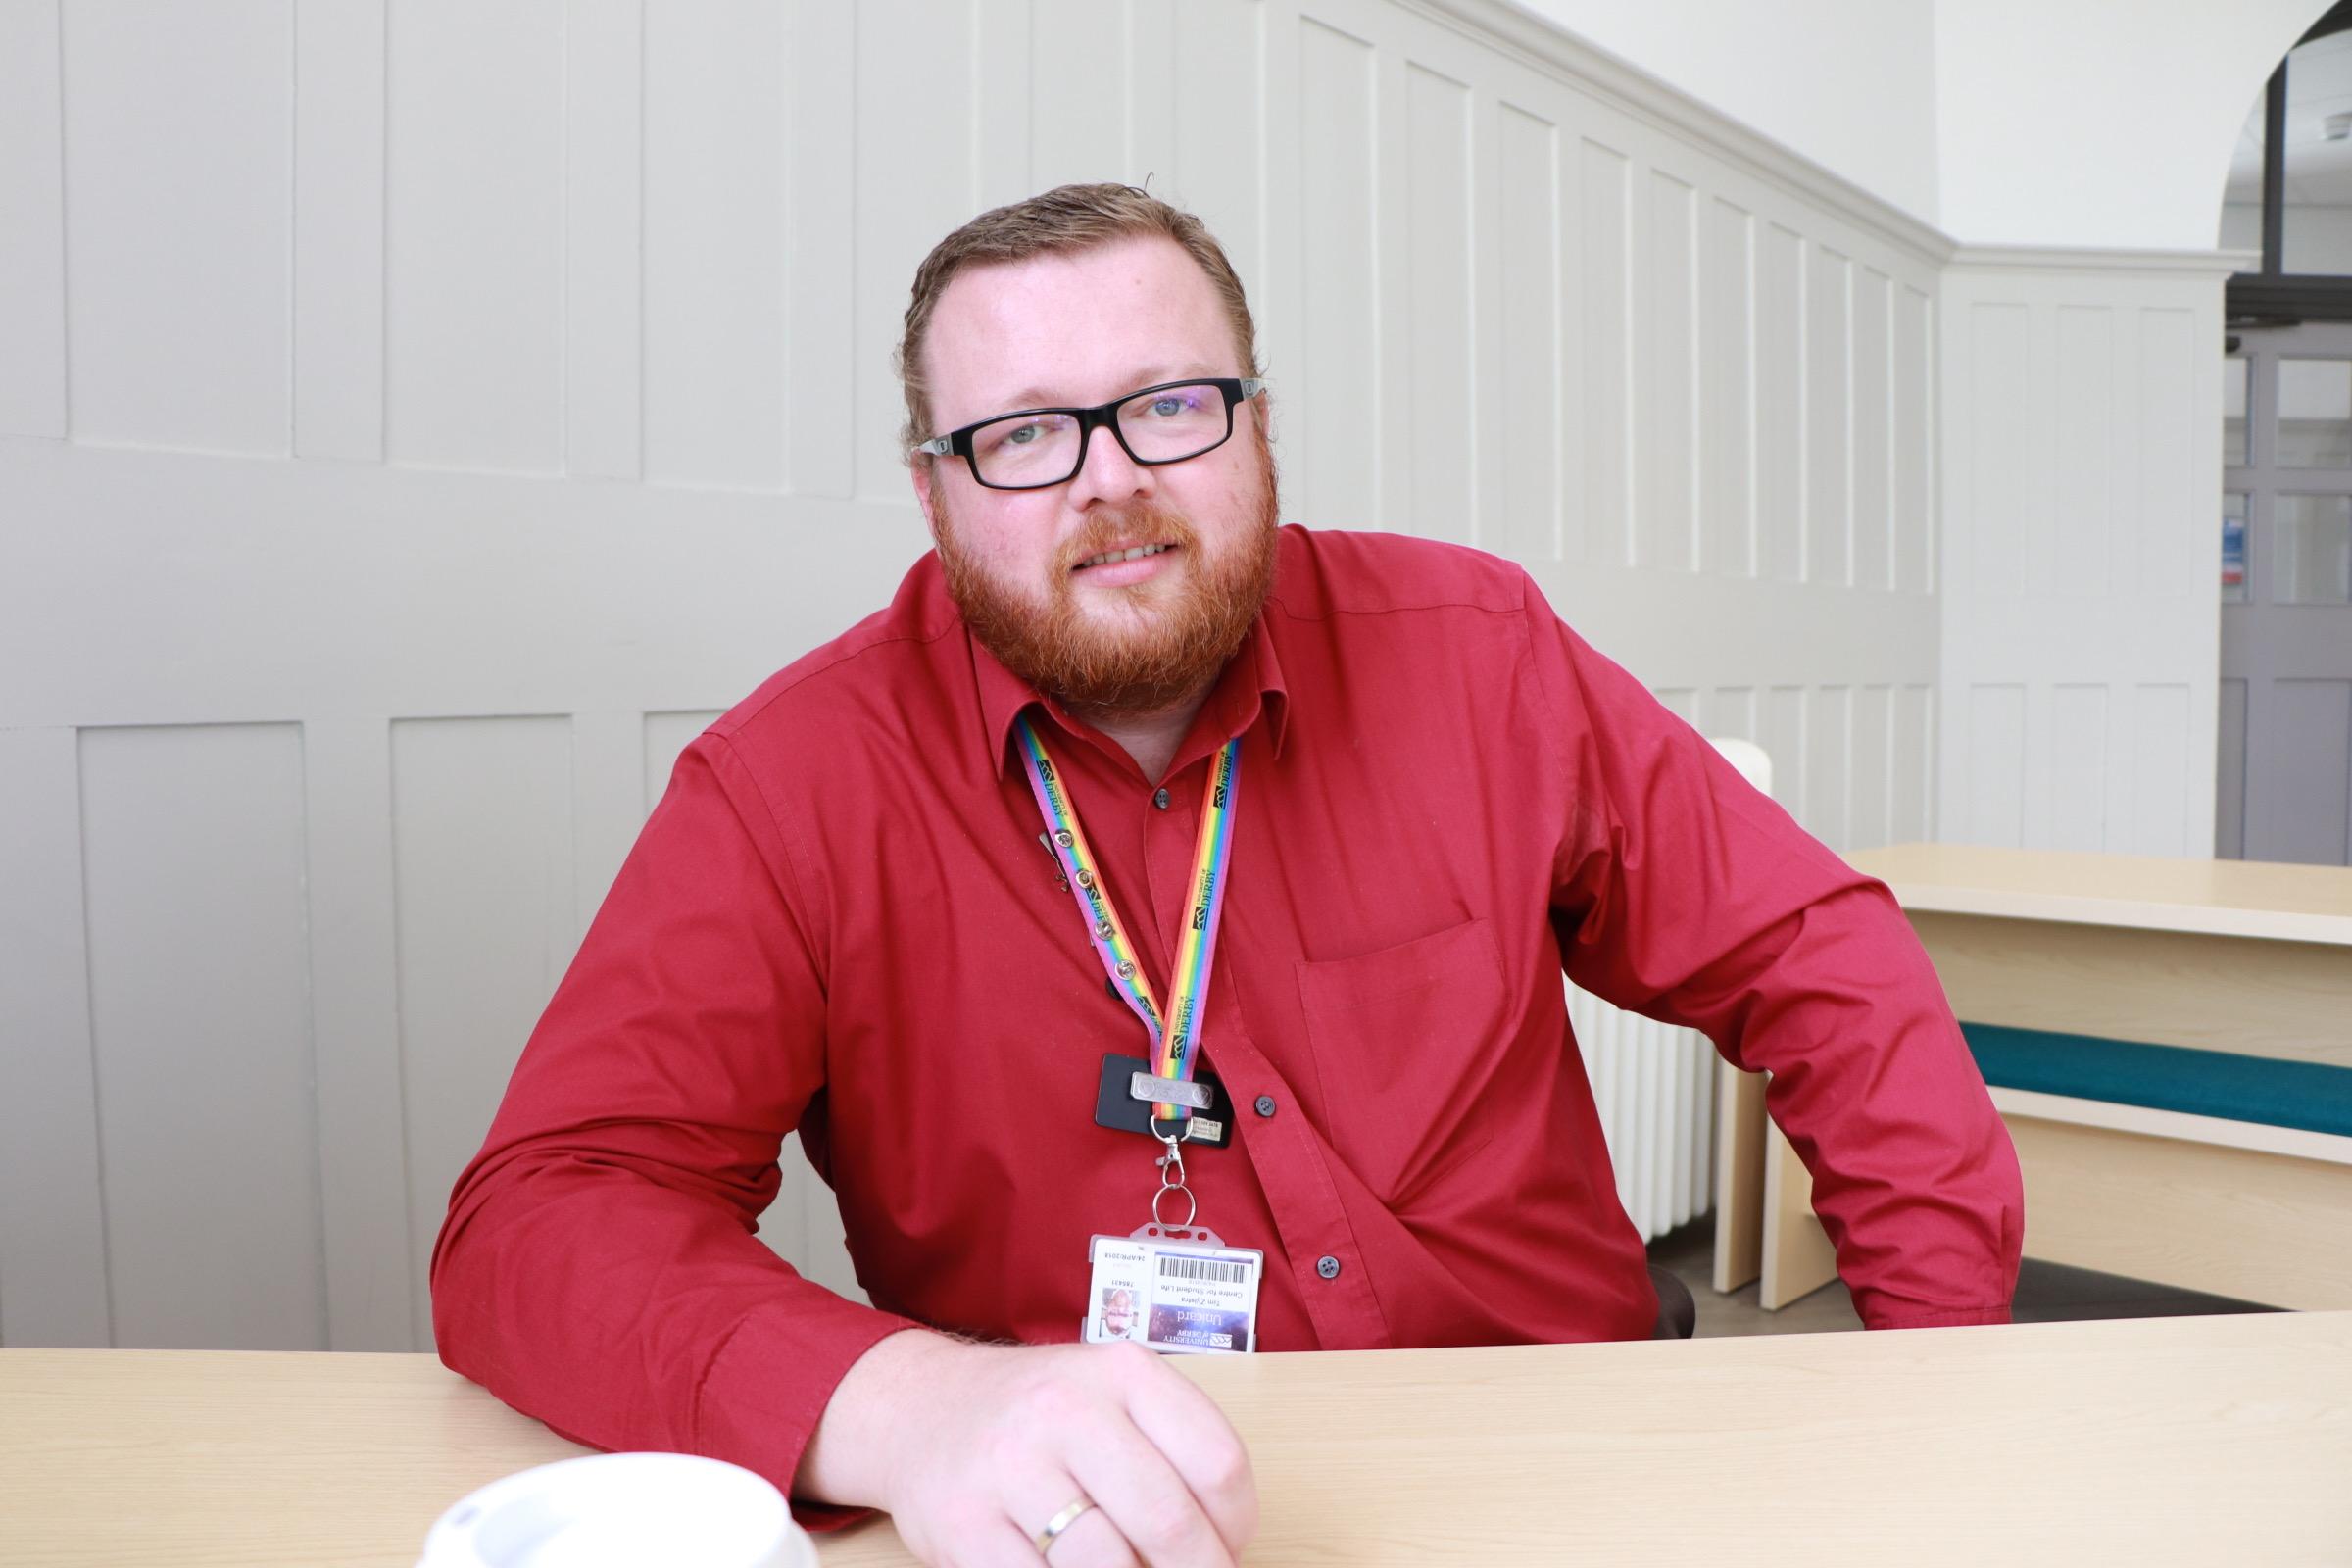 Profile photo of Tim Zijlstra